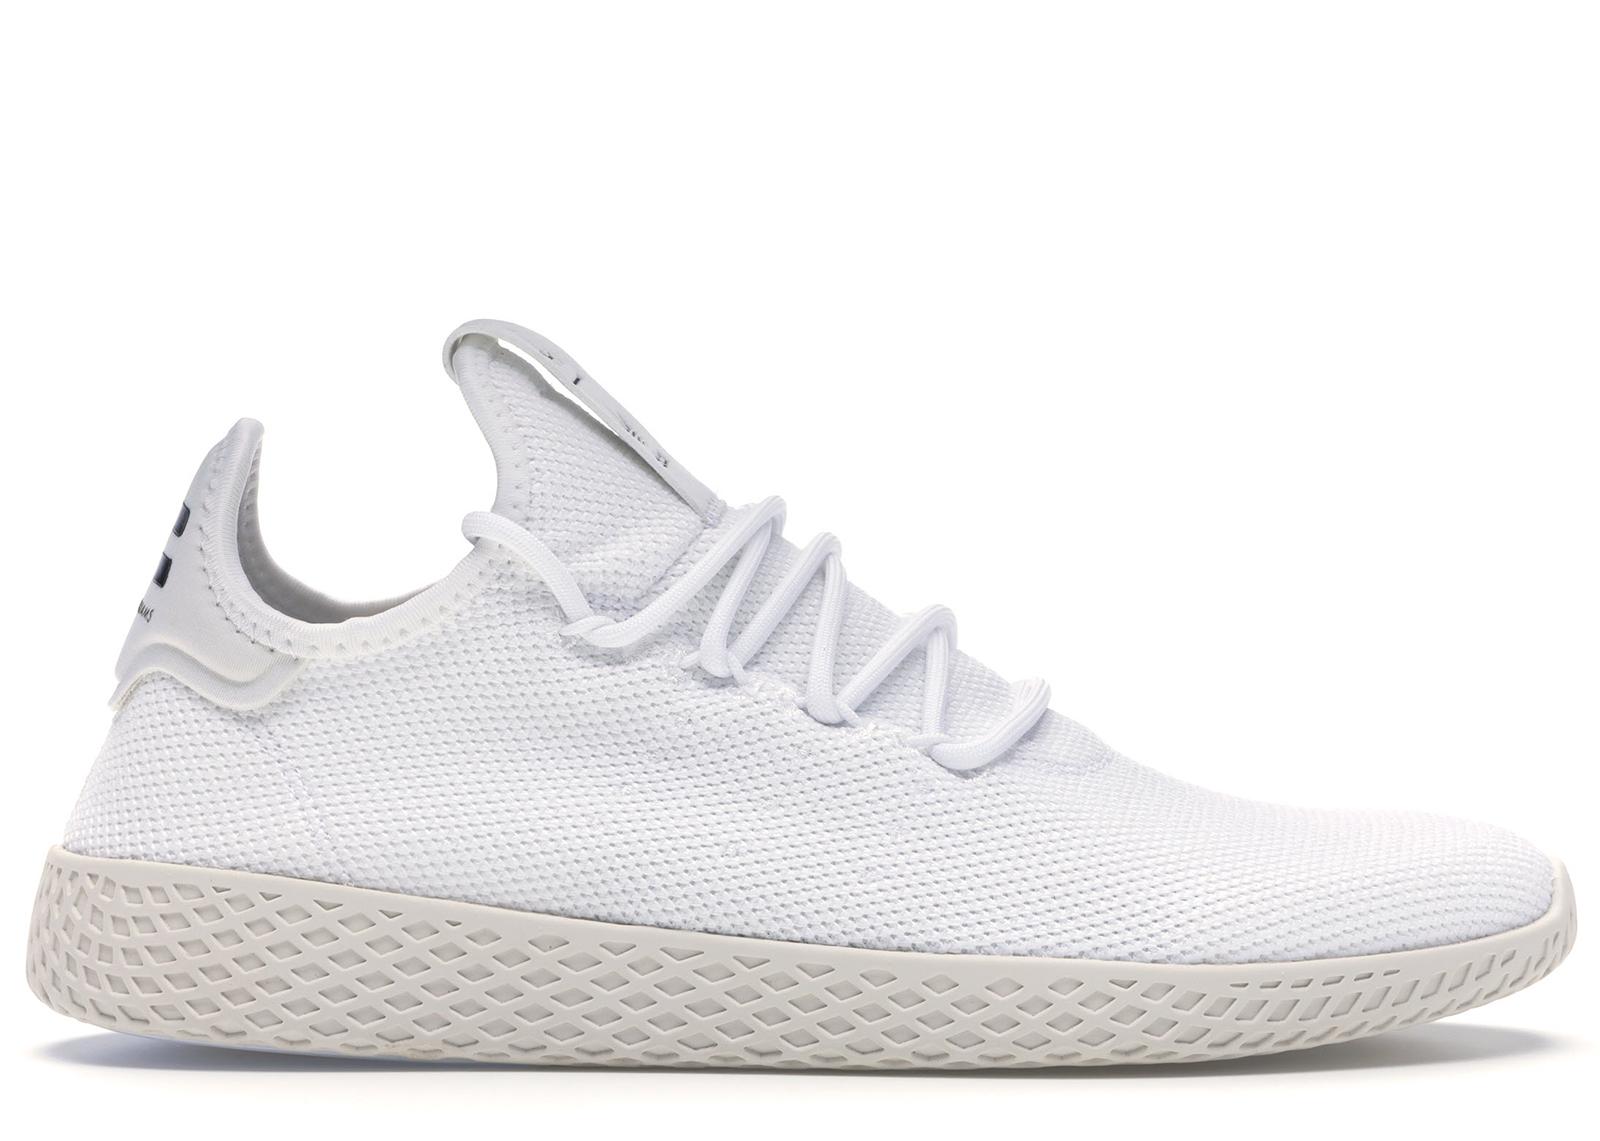 adidas Tennis Hu Pharrell Williams Triple White